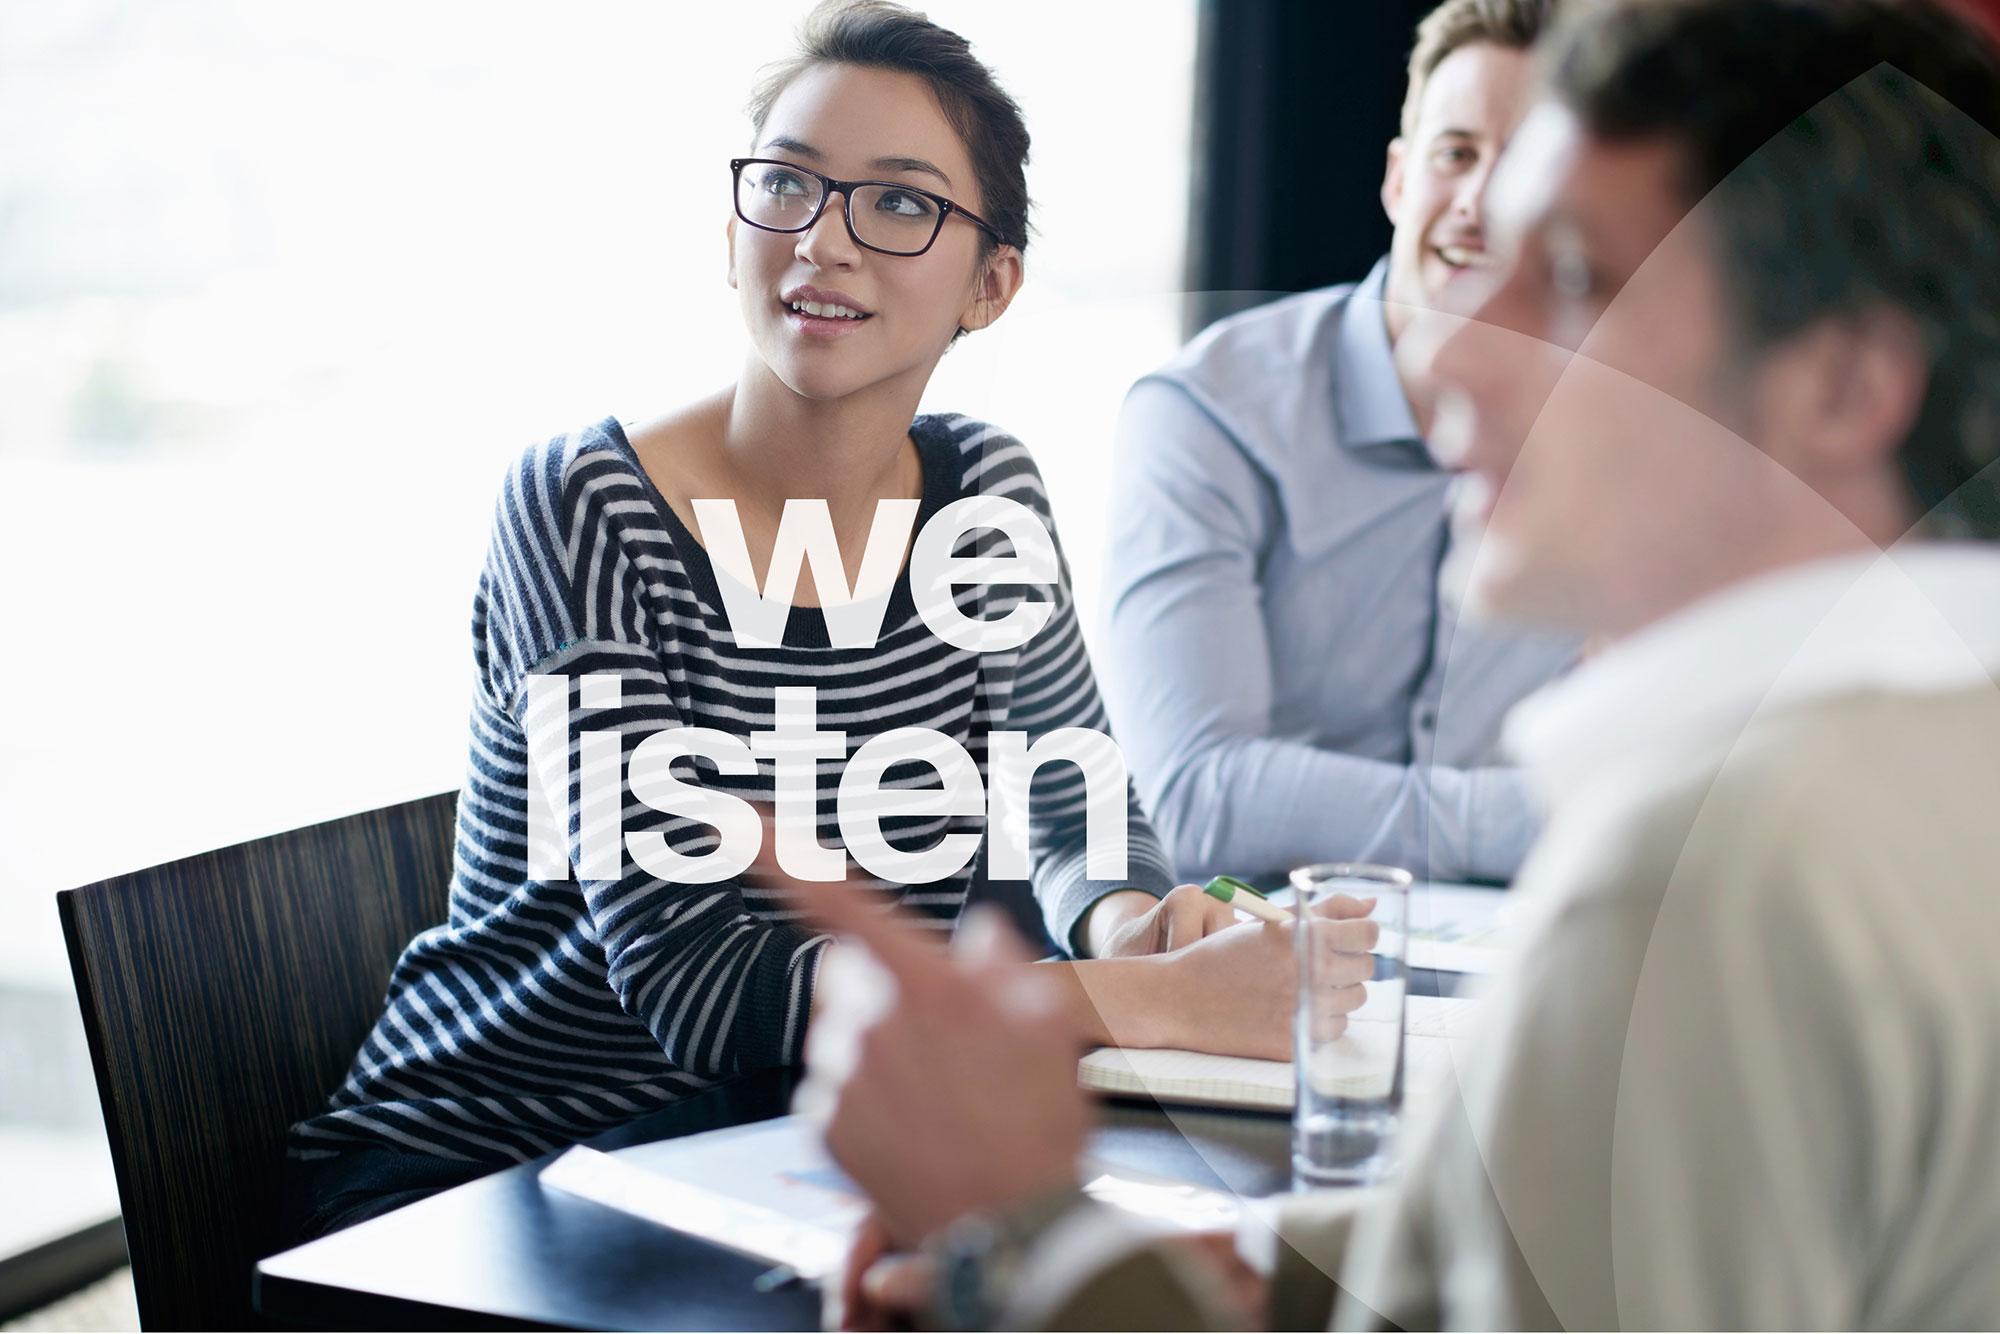 A_we-listen_people.jpg